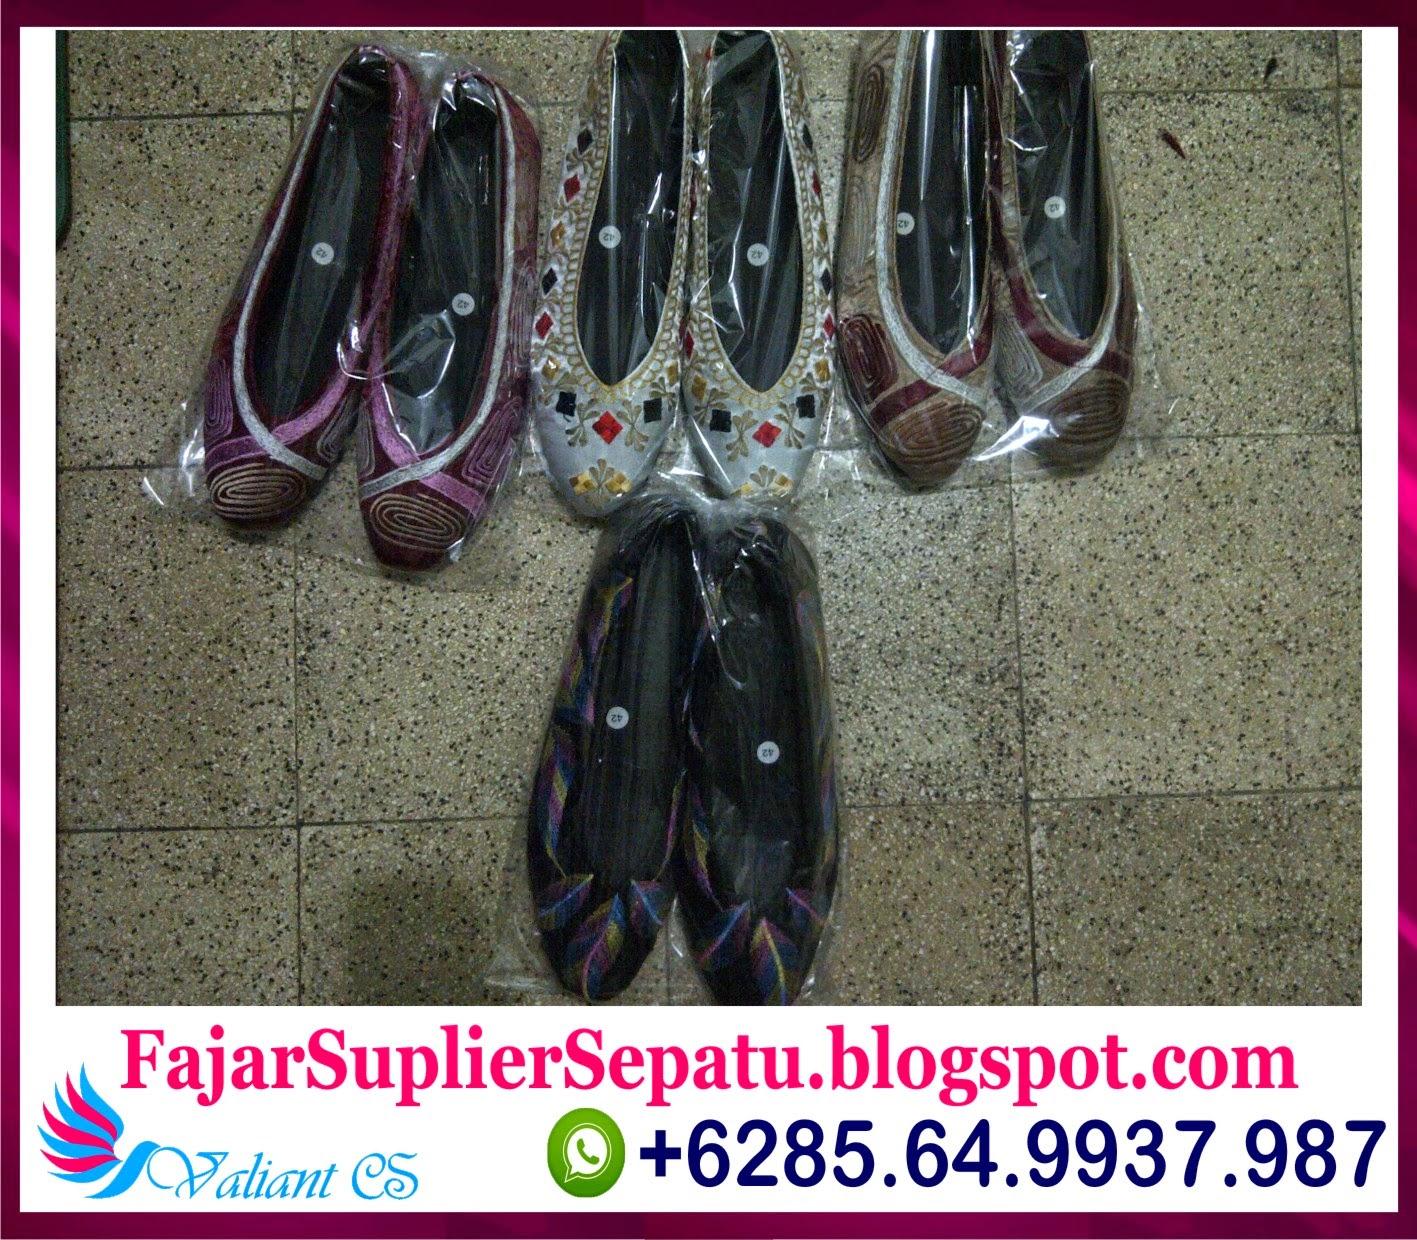 Sepatu Bordir Murah, Produsen Sepatu Bordir Bali, Produsen Sepatu Bordir Sidoarjo, +62.8564.993.7987